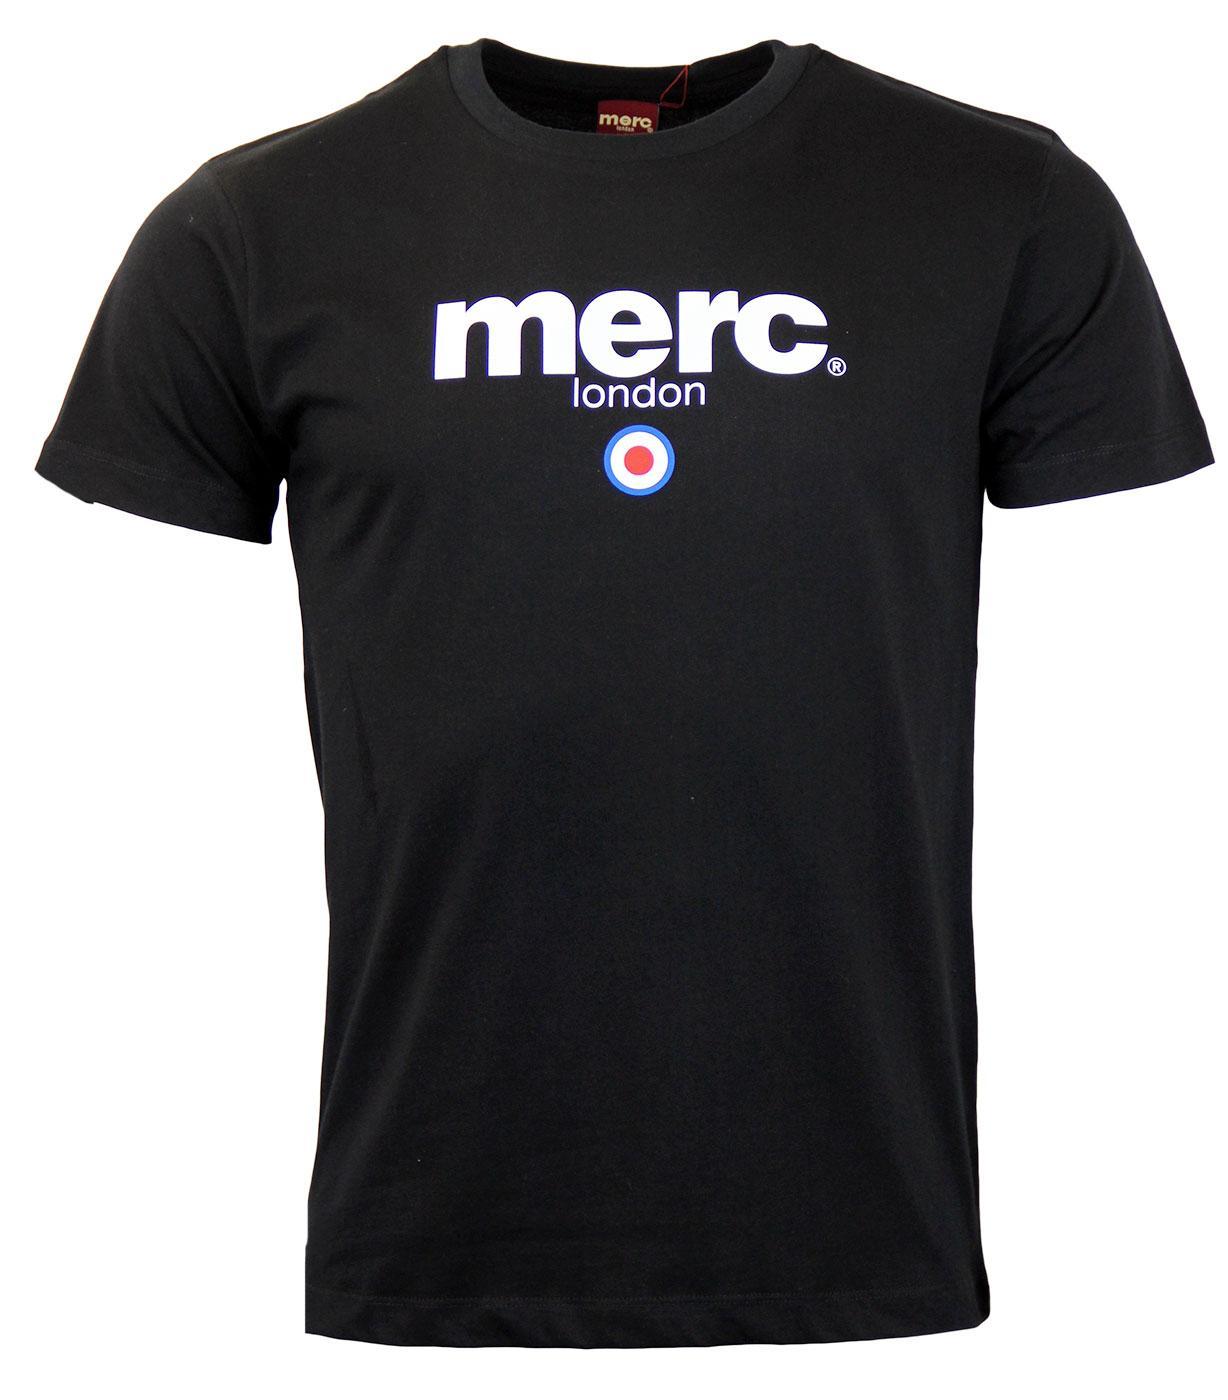 Brighton MERC Retro Mod Target Signature T-Shirt B